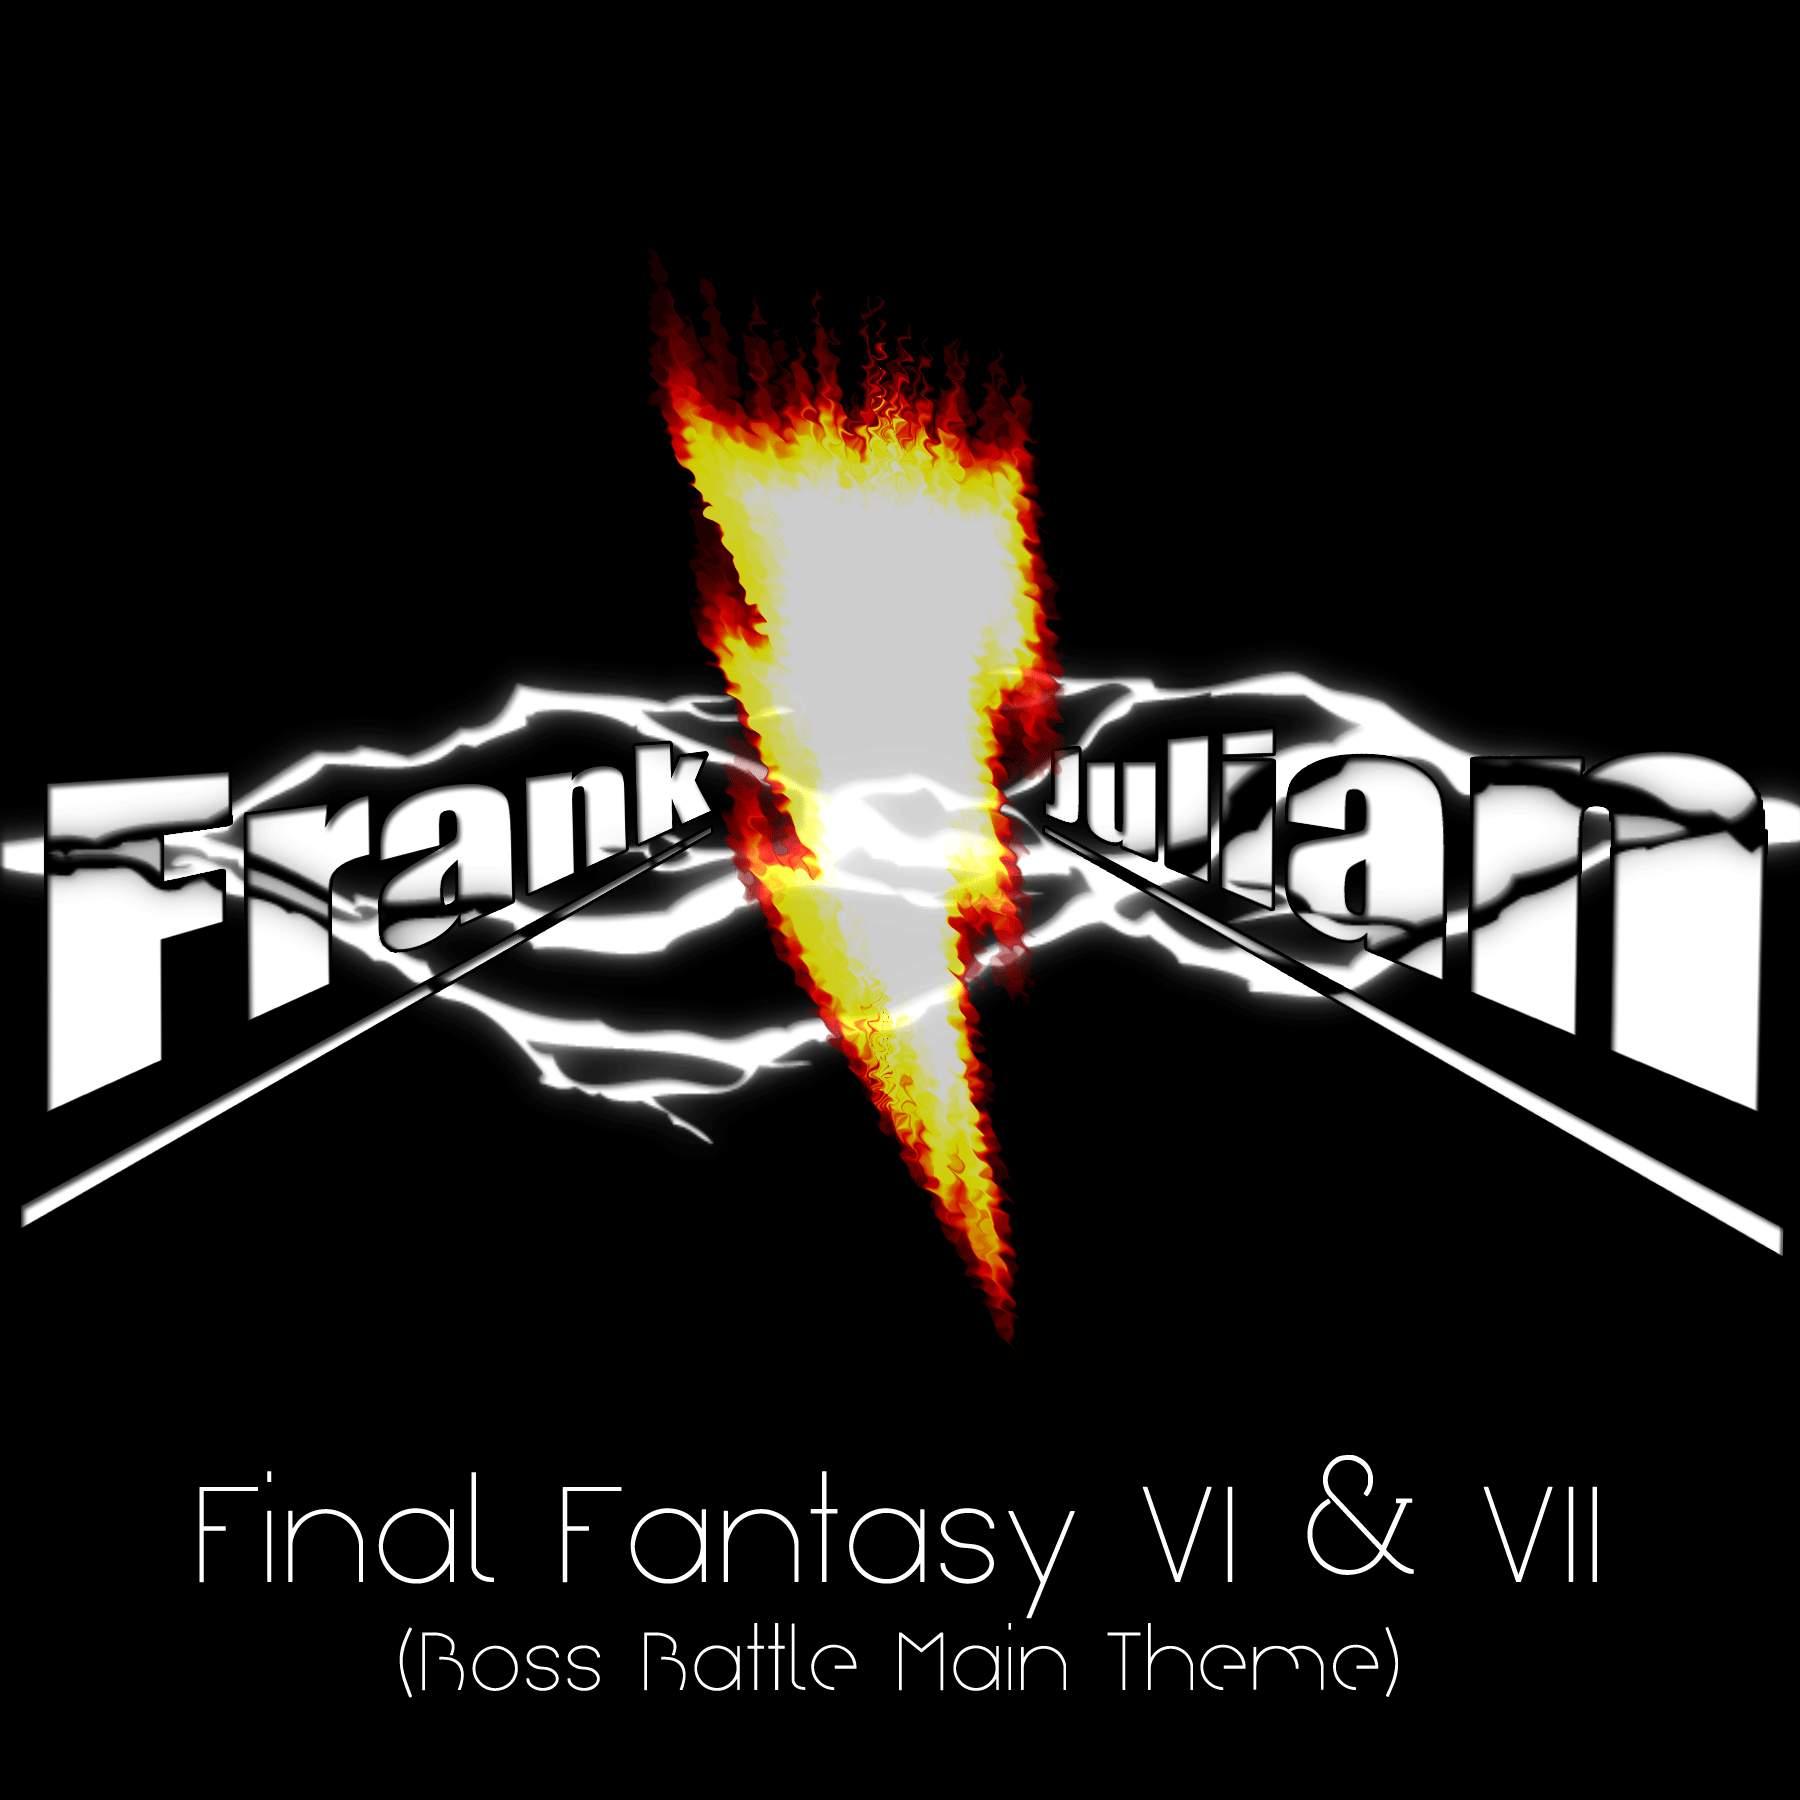 Uematsu, Nobuo: Final Fantasy VI & VII: The Decisive Battle /Those Who Fight Further (Medley | Metal Cover)